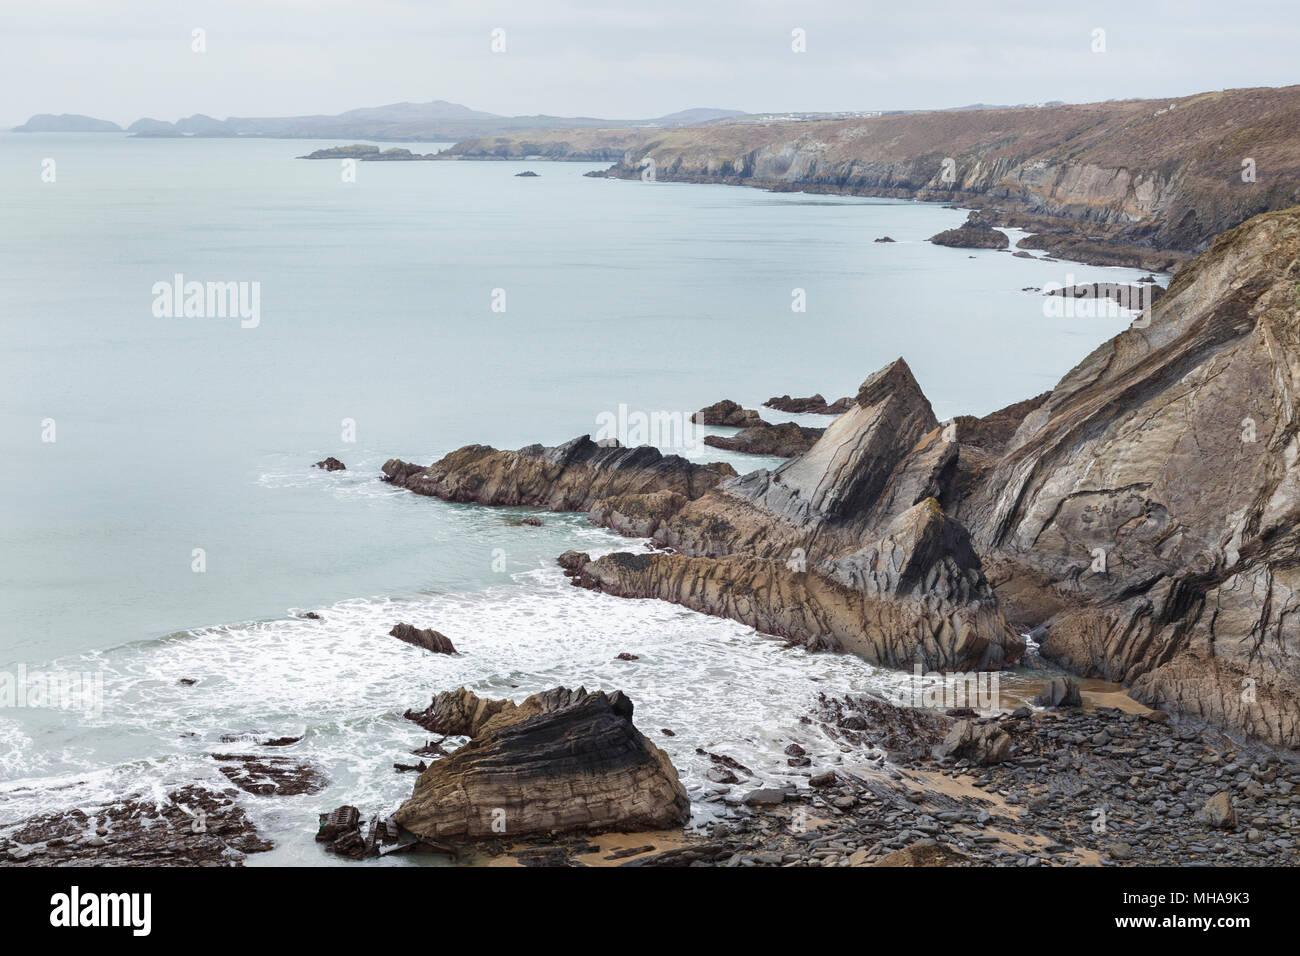 Moody coastline of Pembrokshire, Wales, seen from coast path. Stock Photo